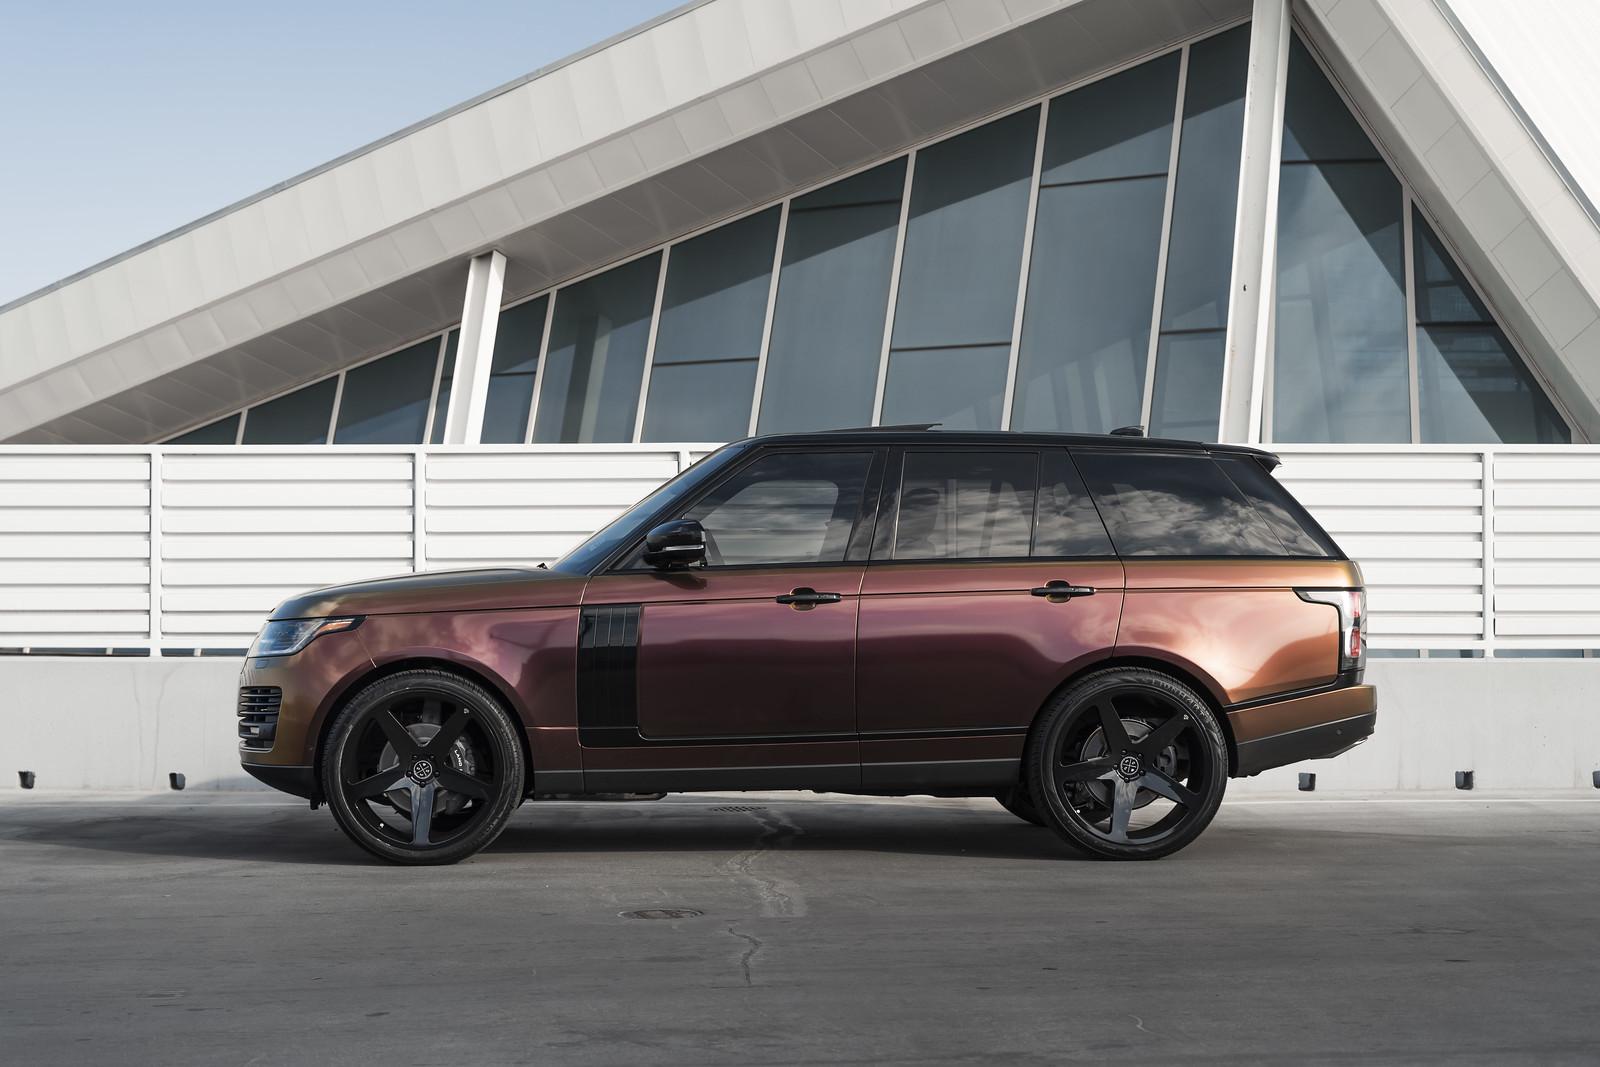 2020_Land_Rover_Range_Rover_HSC_BD15_Gloss_Black_6